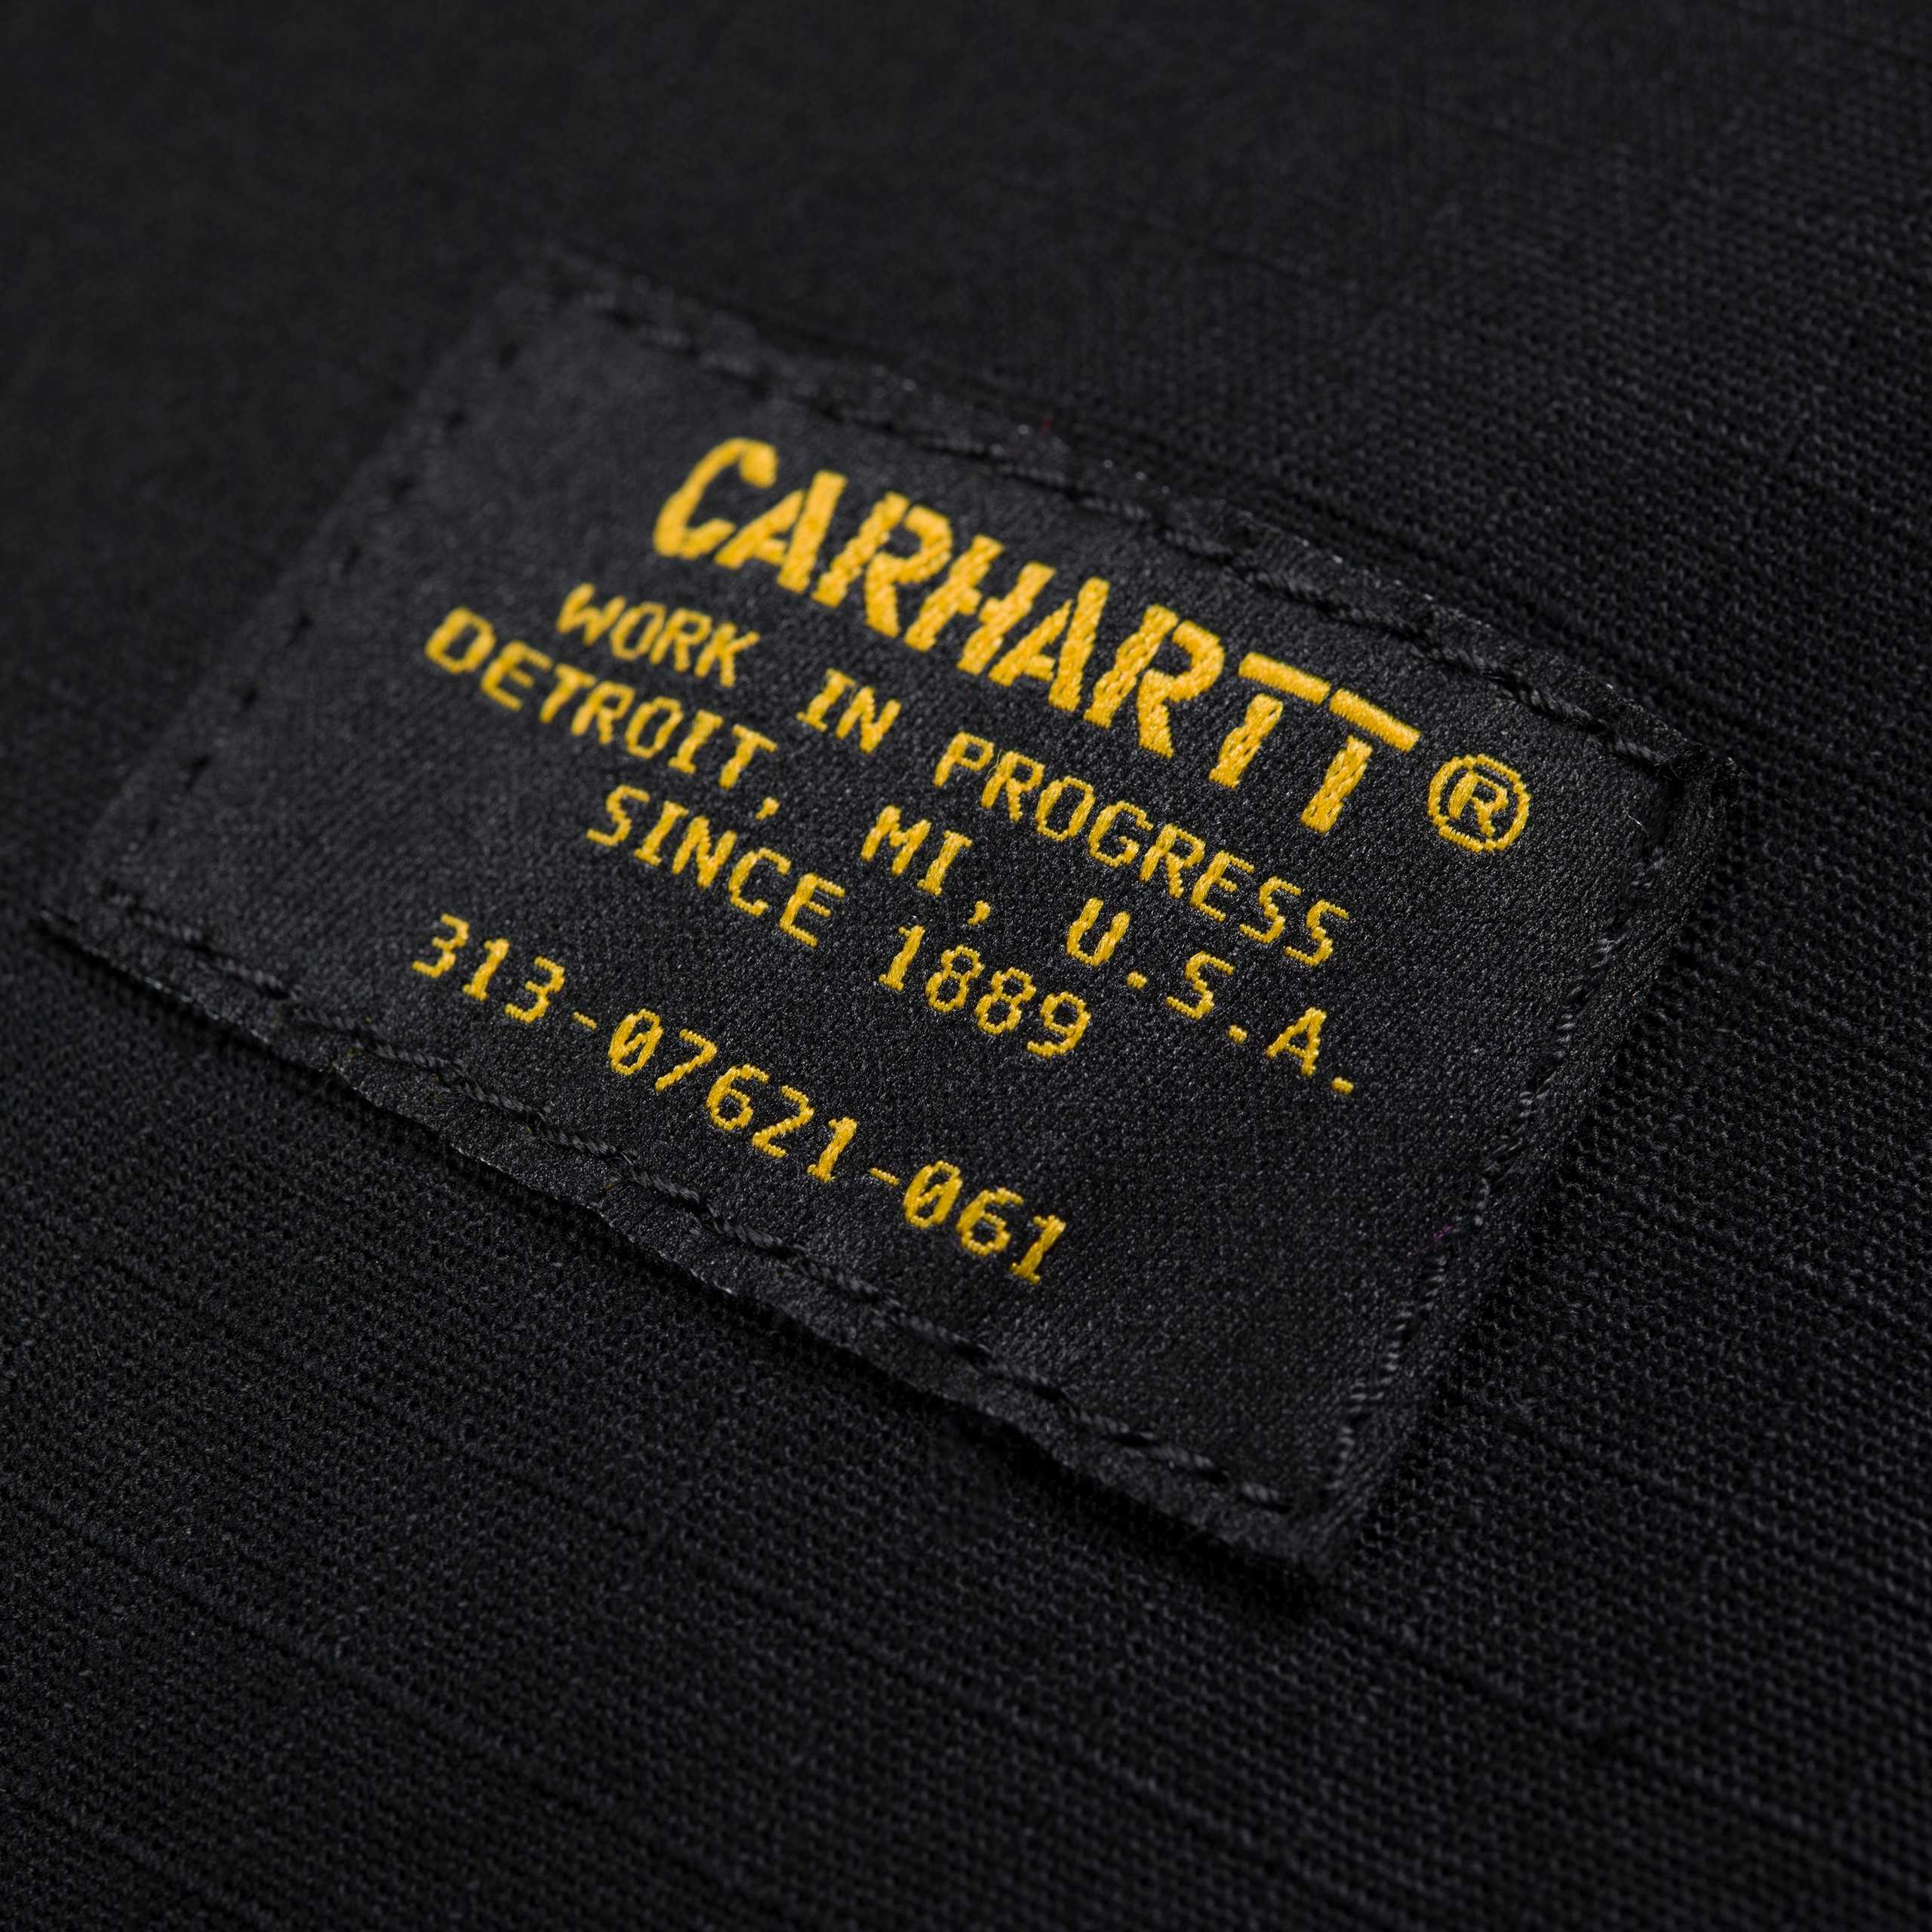 Carhartt Black Mission Shirt